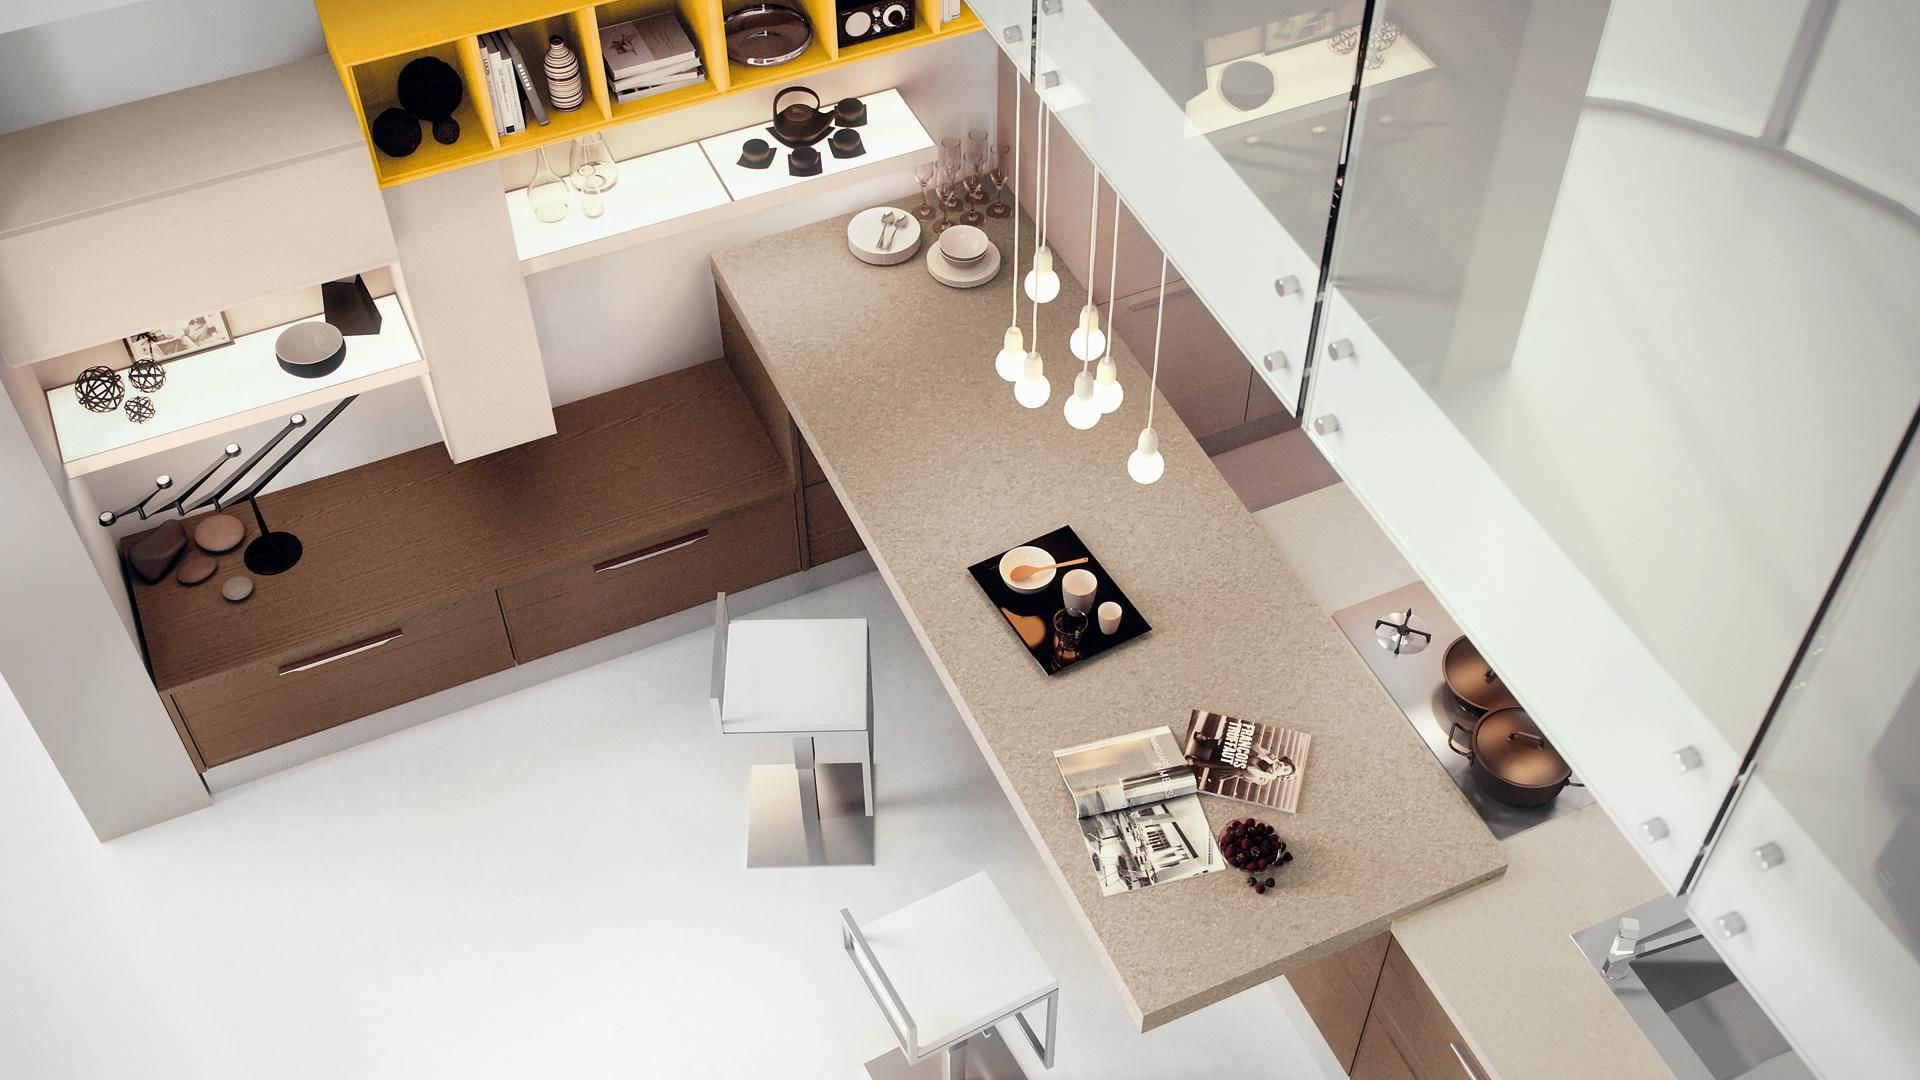 Moderne Küche / Holzfurnier / Kochinsel / lackiert - ADELE ...